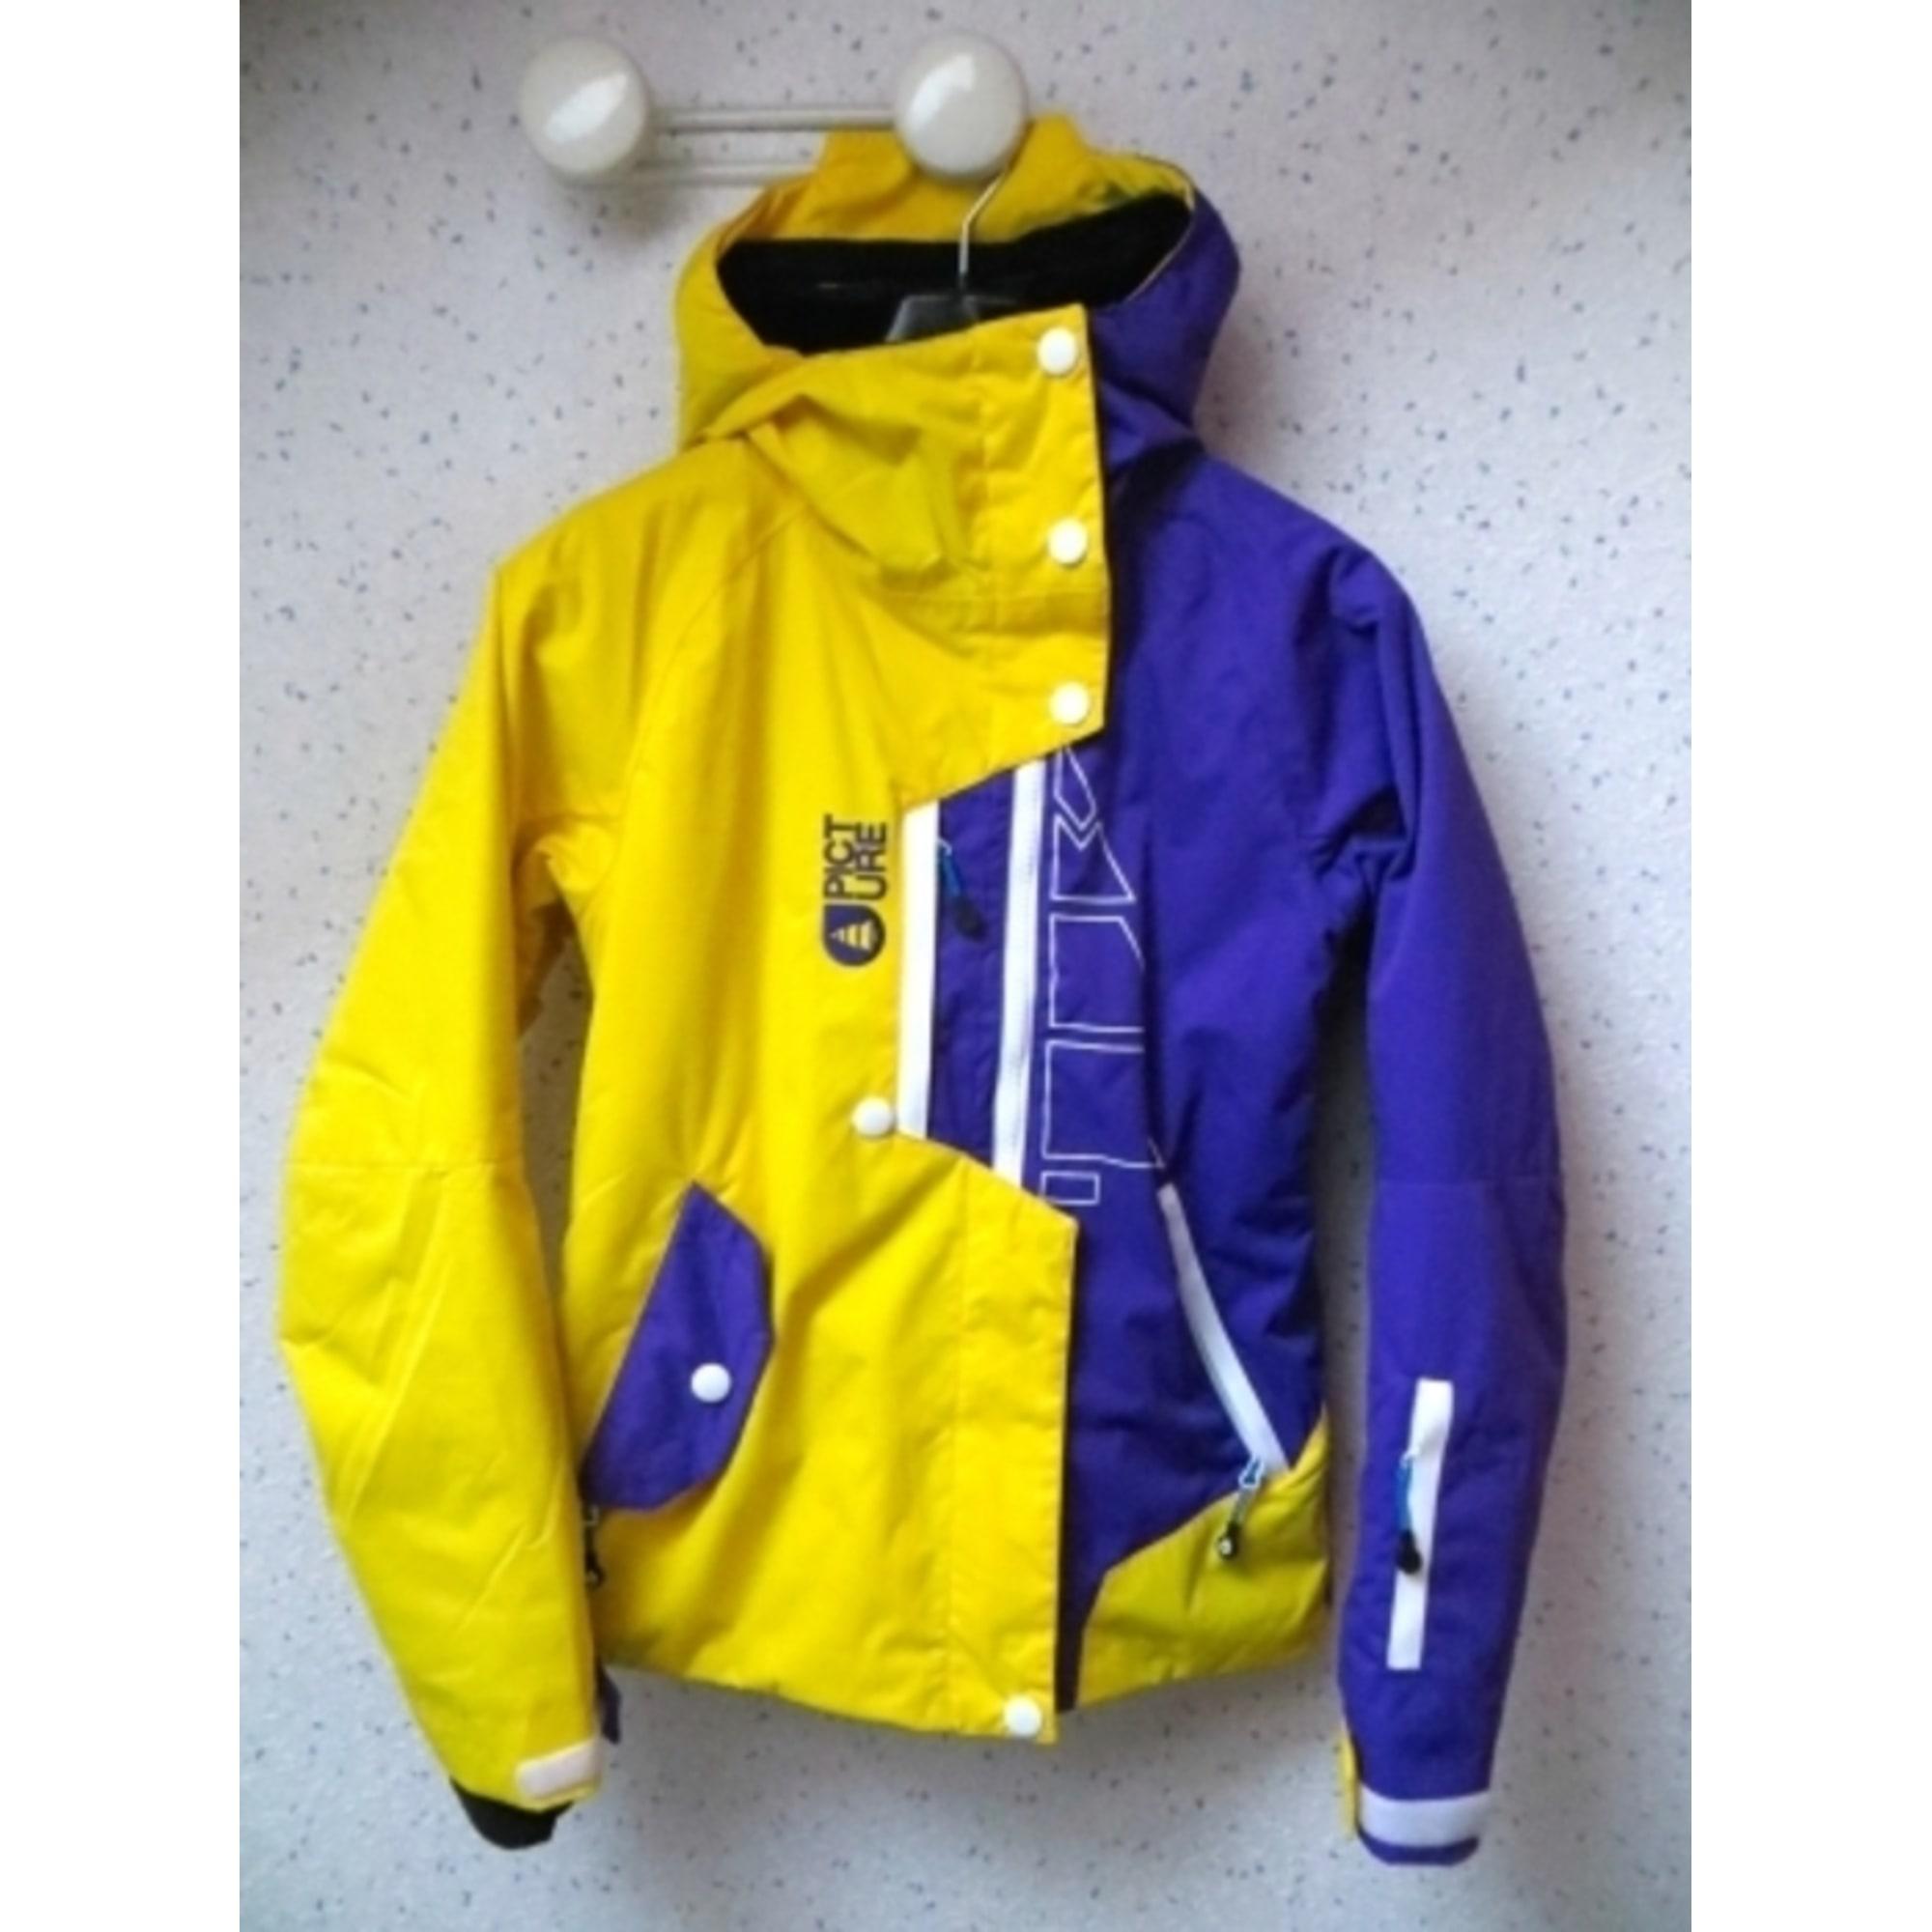 Blouson de ski PICTURE ORGANIC CLOTHING 36 (S, T1) jaune - 5930838 929444c6984